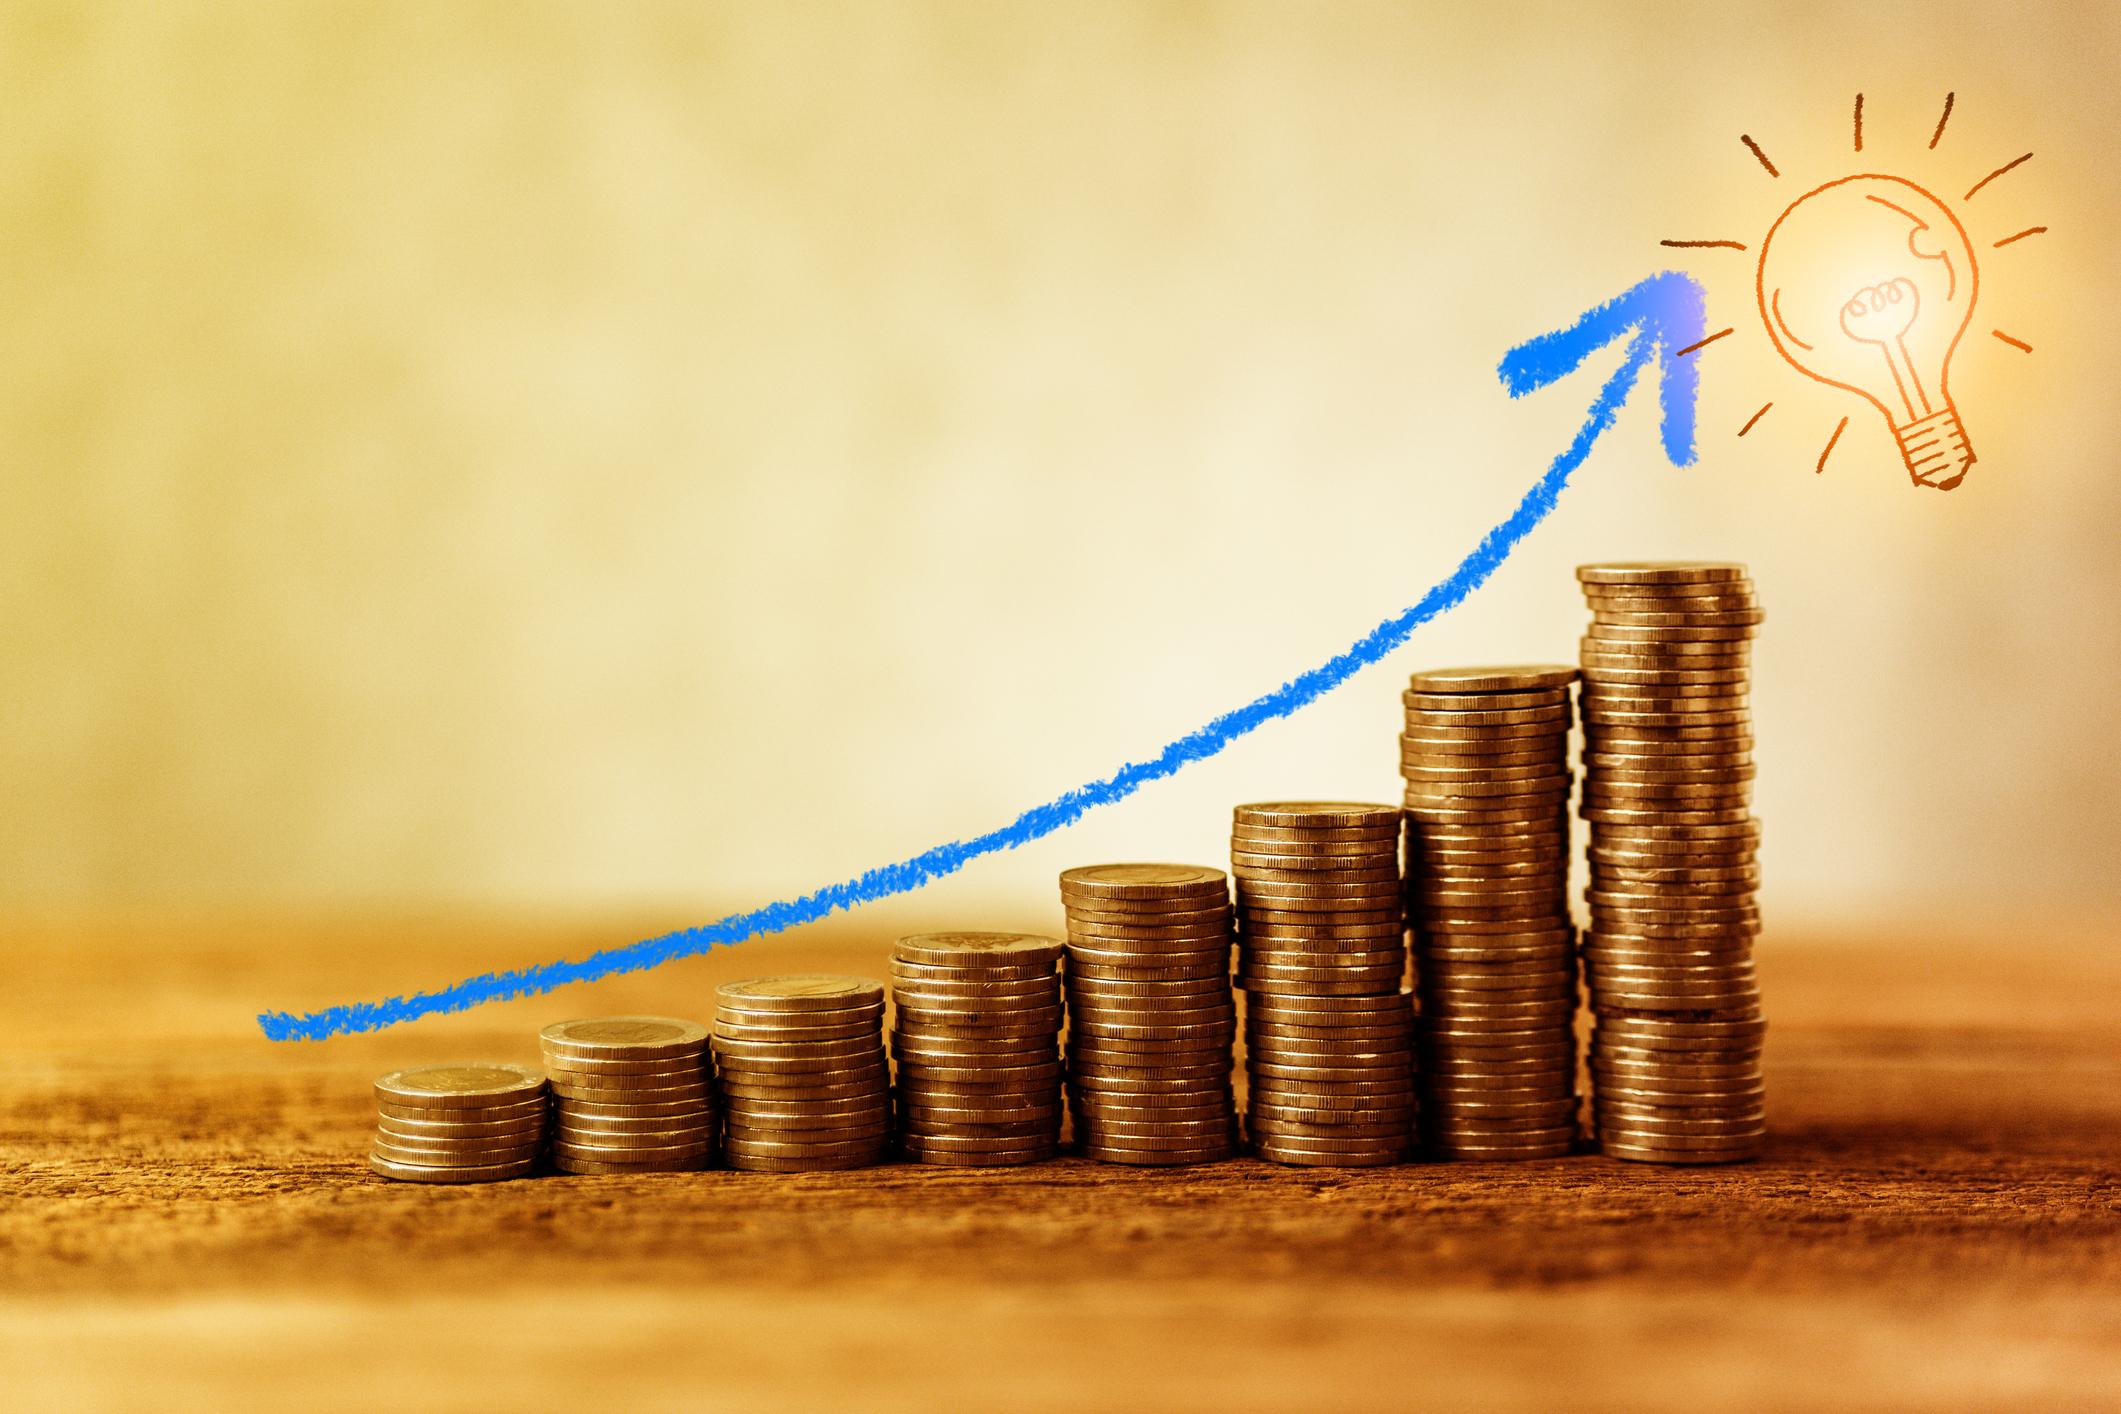 3 Small-Cap Stocks With Big-Cap Potential | The Motley Fool